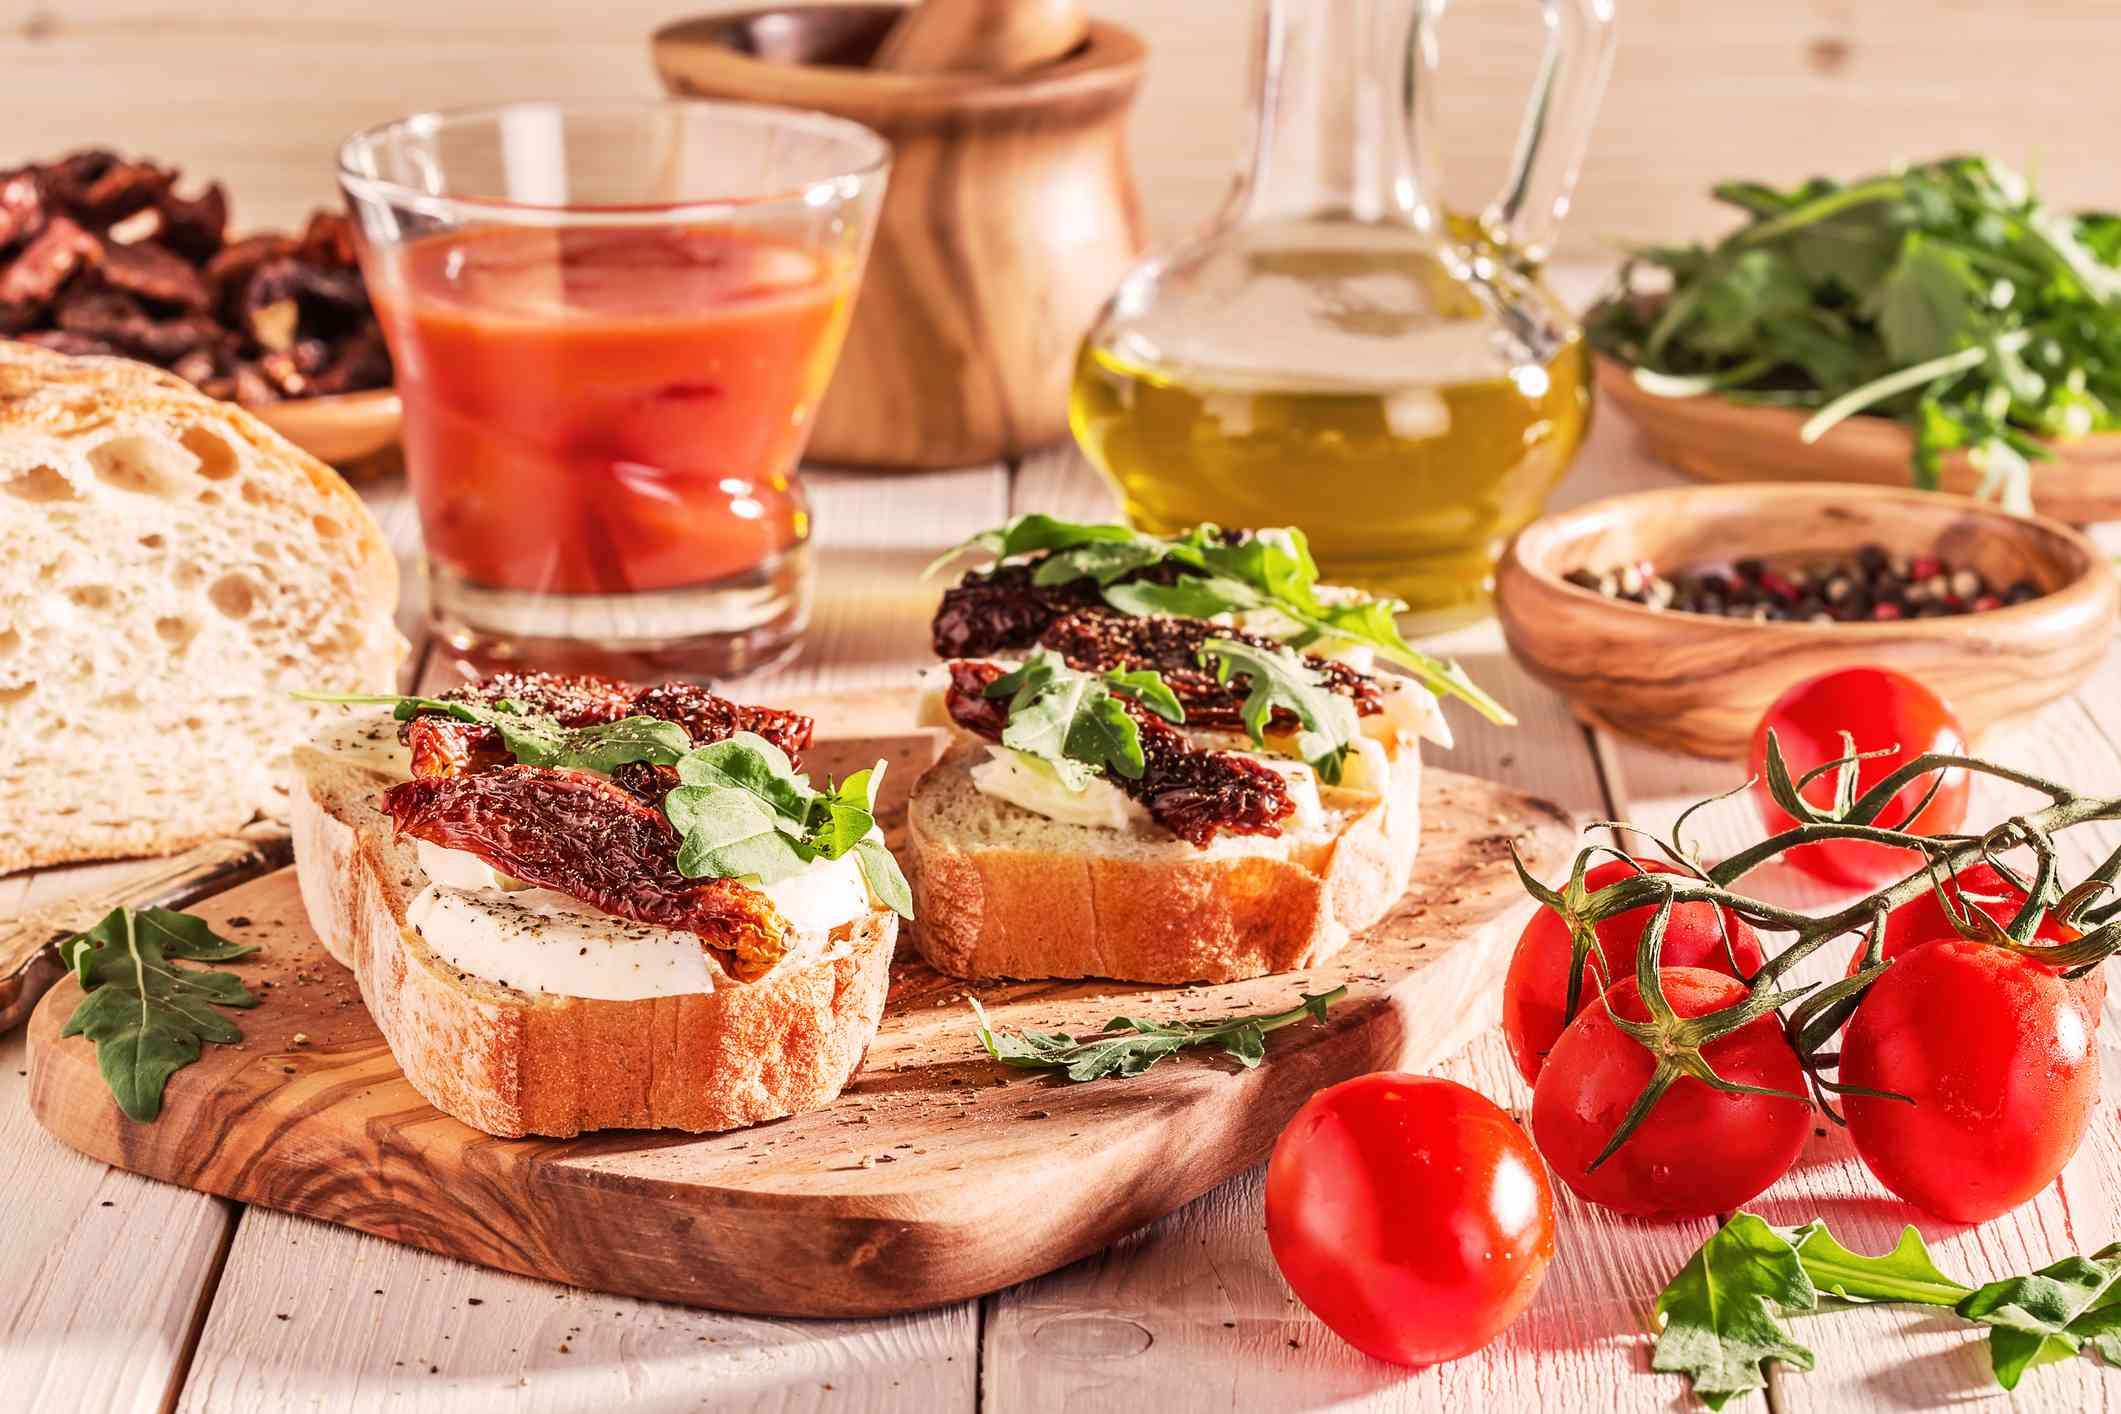 Mediterranean diet foods arranged on a wooden table